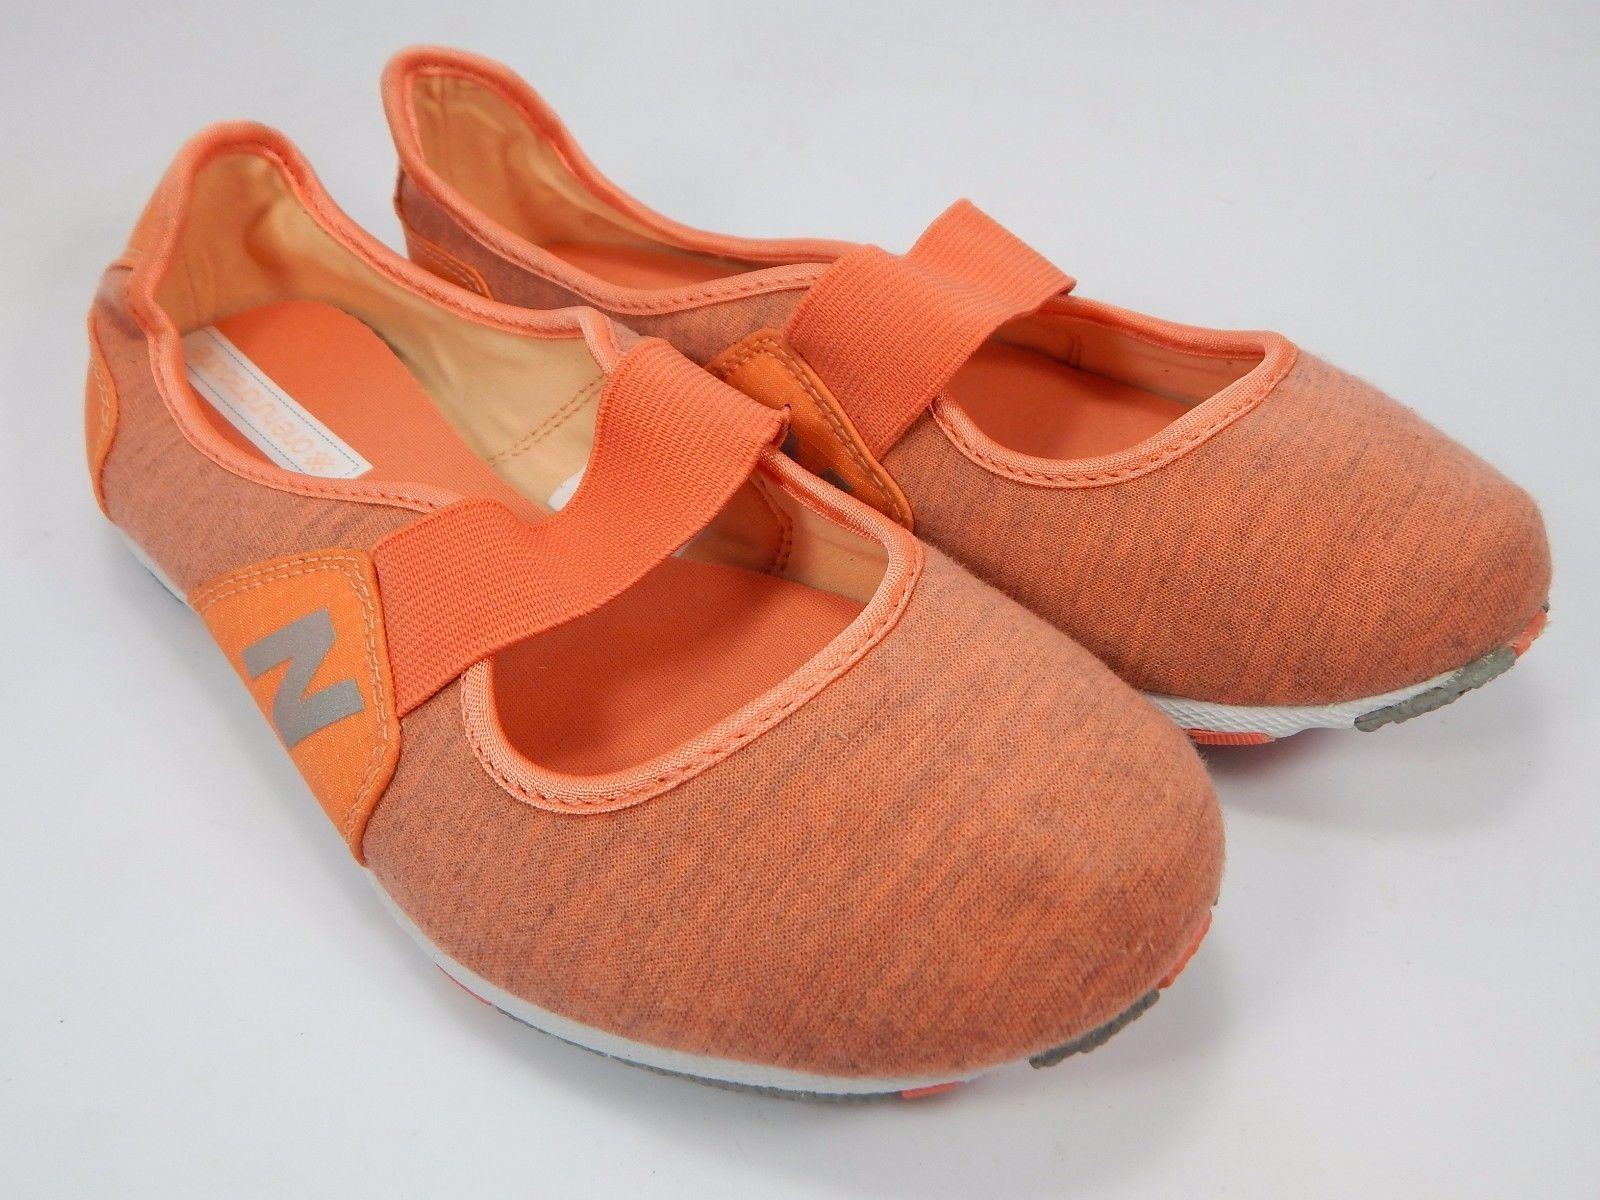 New Balance 101 Women's Classic Slip On Shoes Size US 7 M (B) EU 37.5 WL101OR